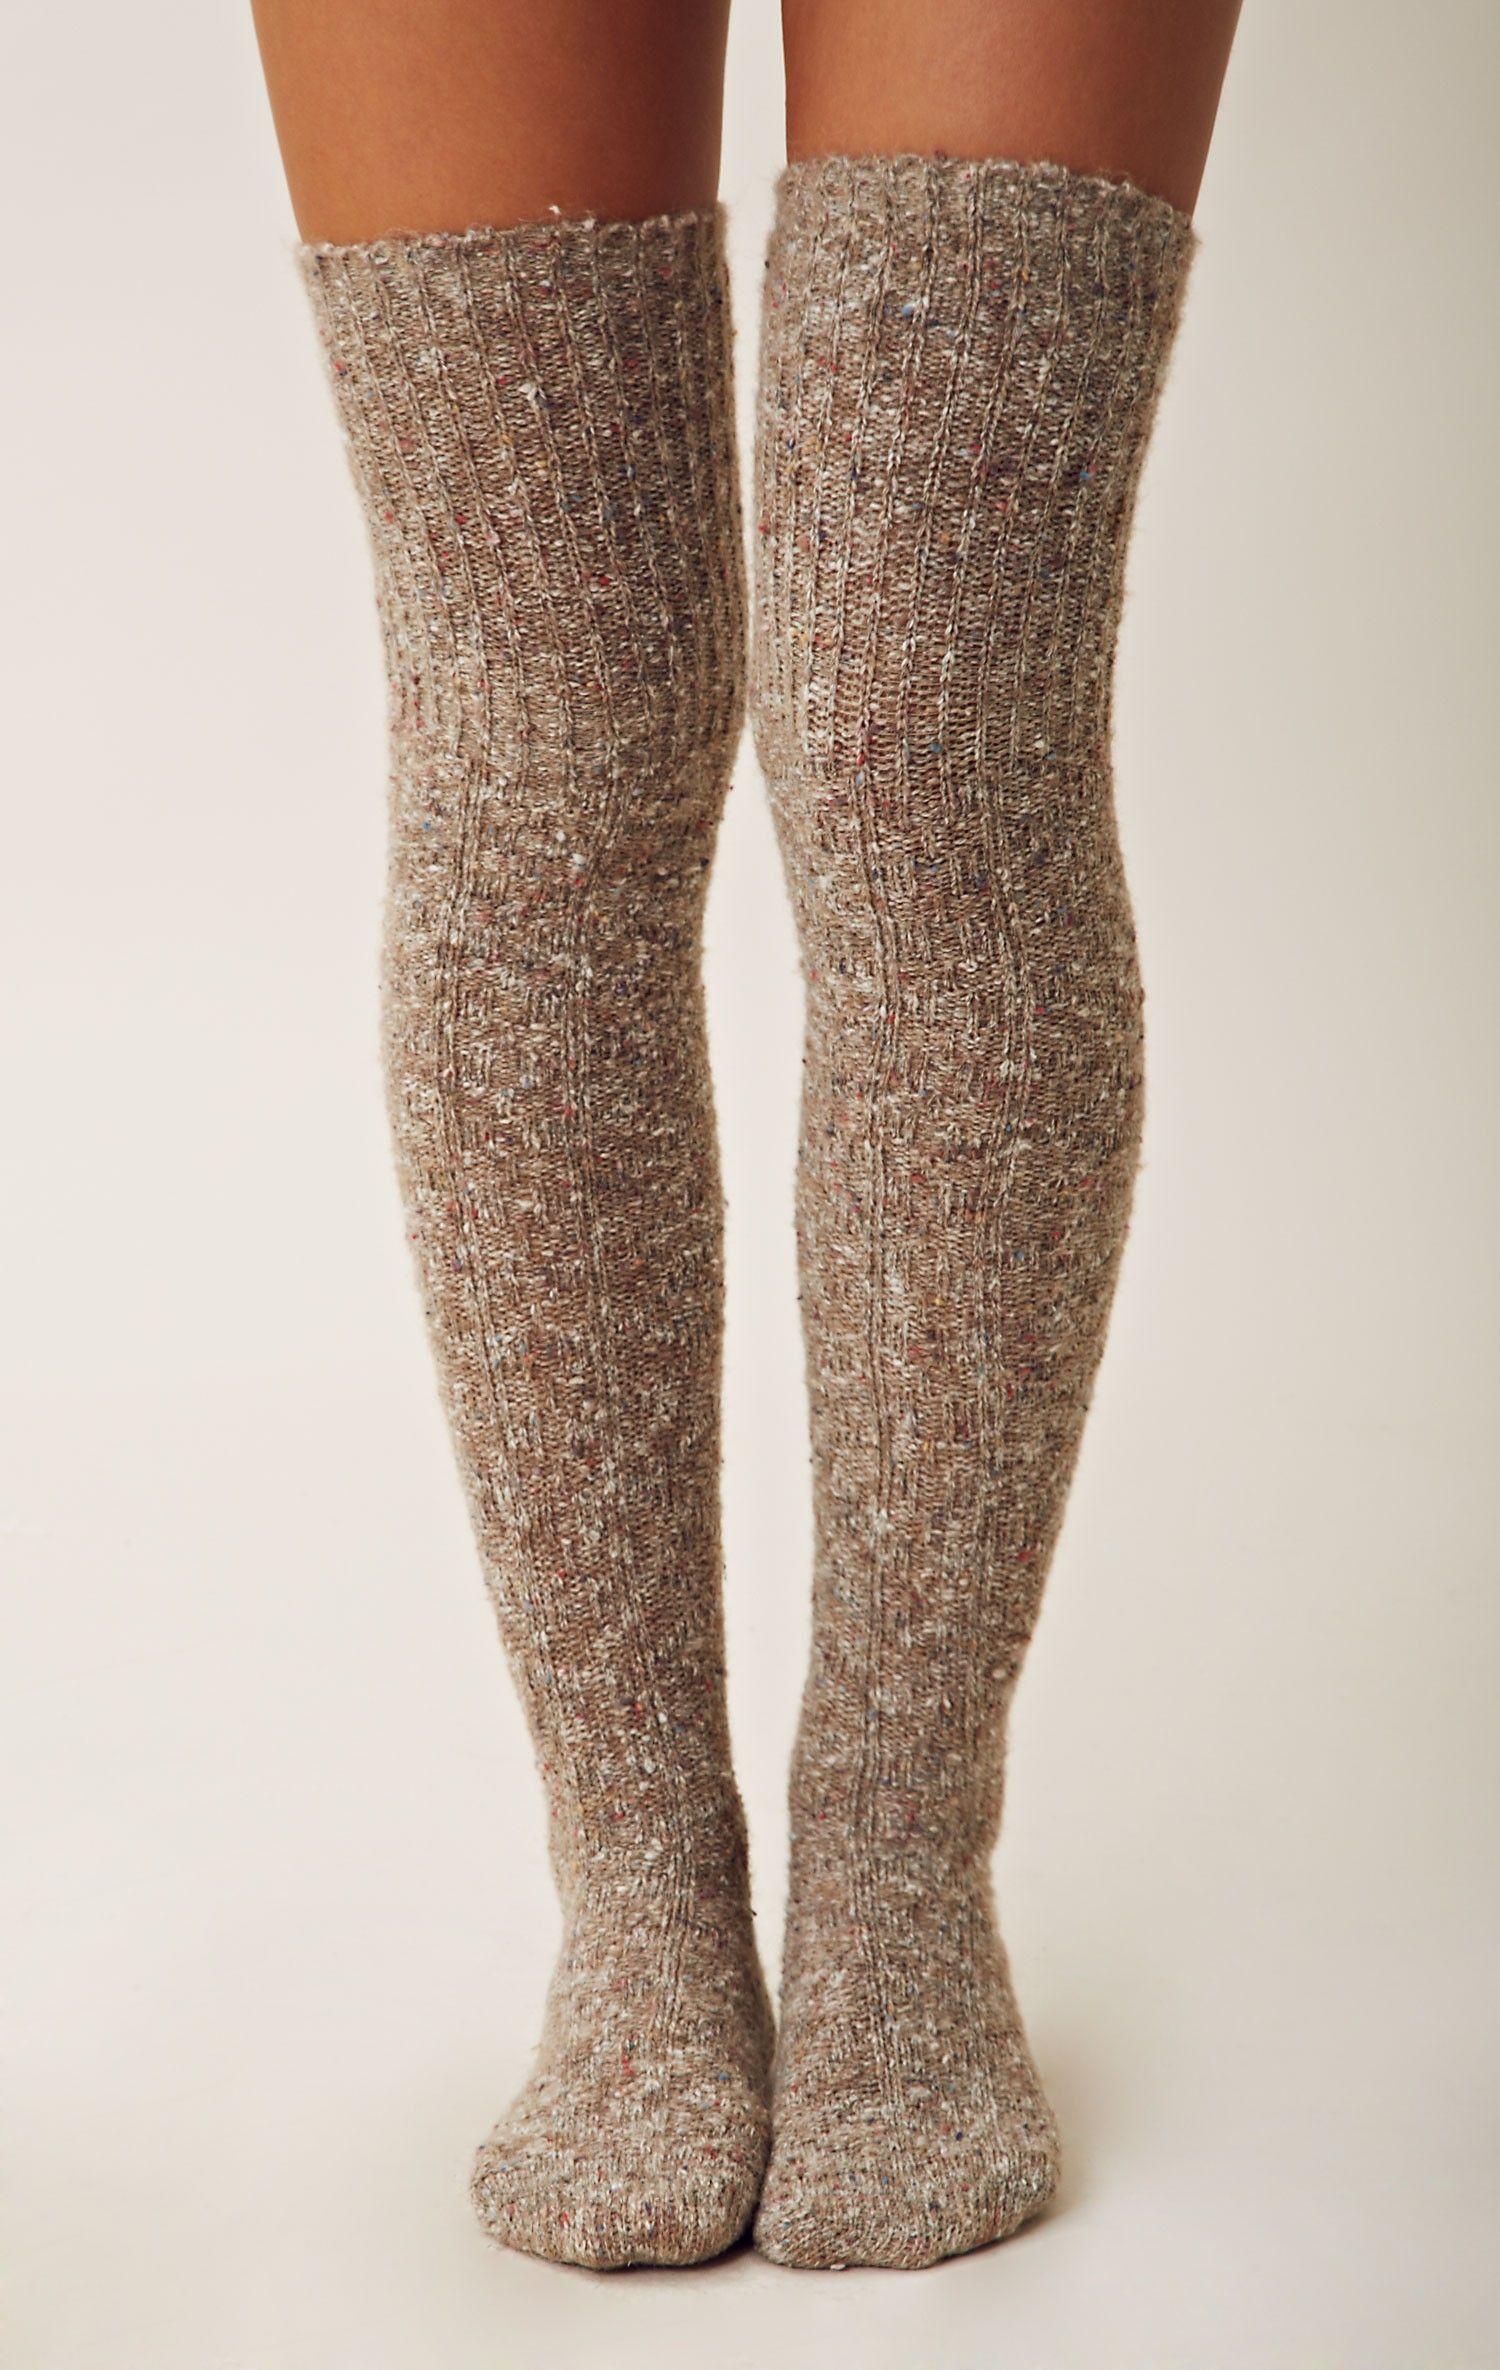 Vintage thigh high socks